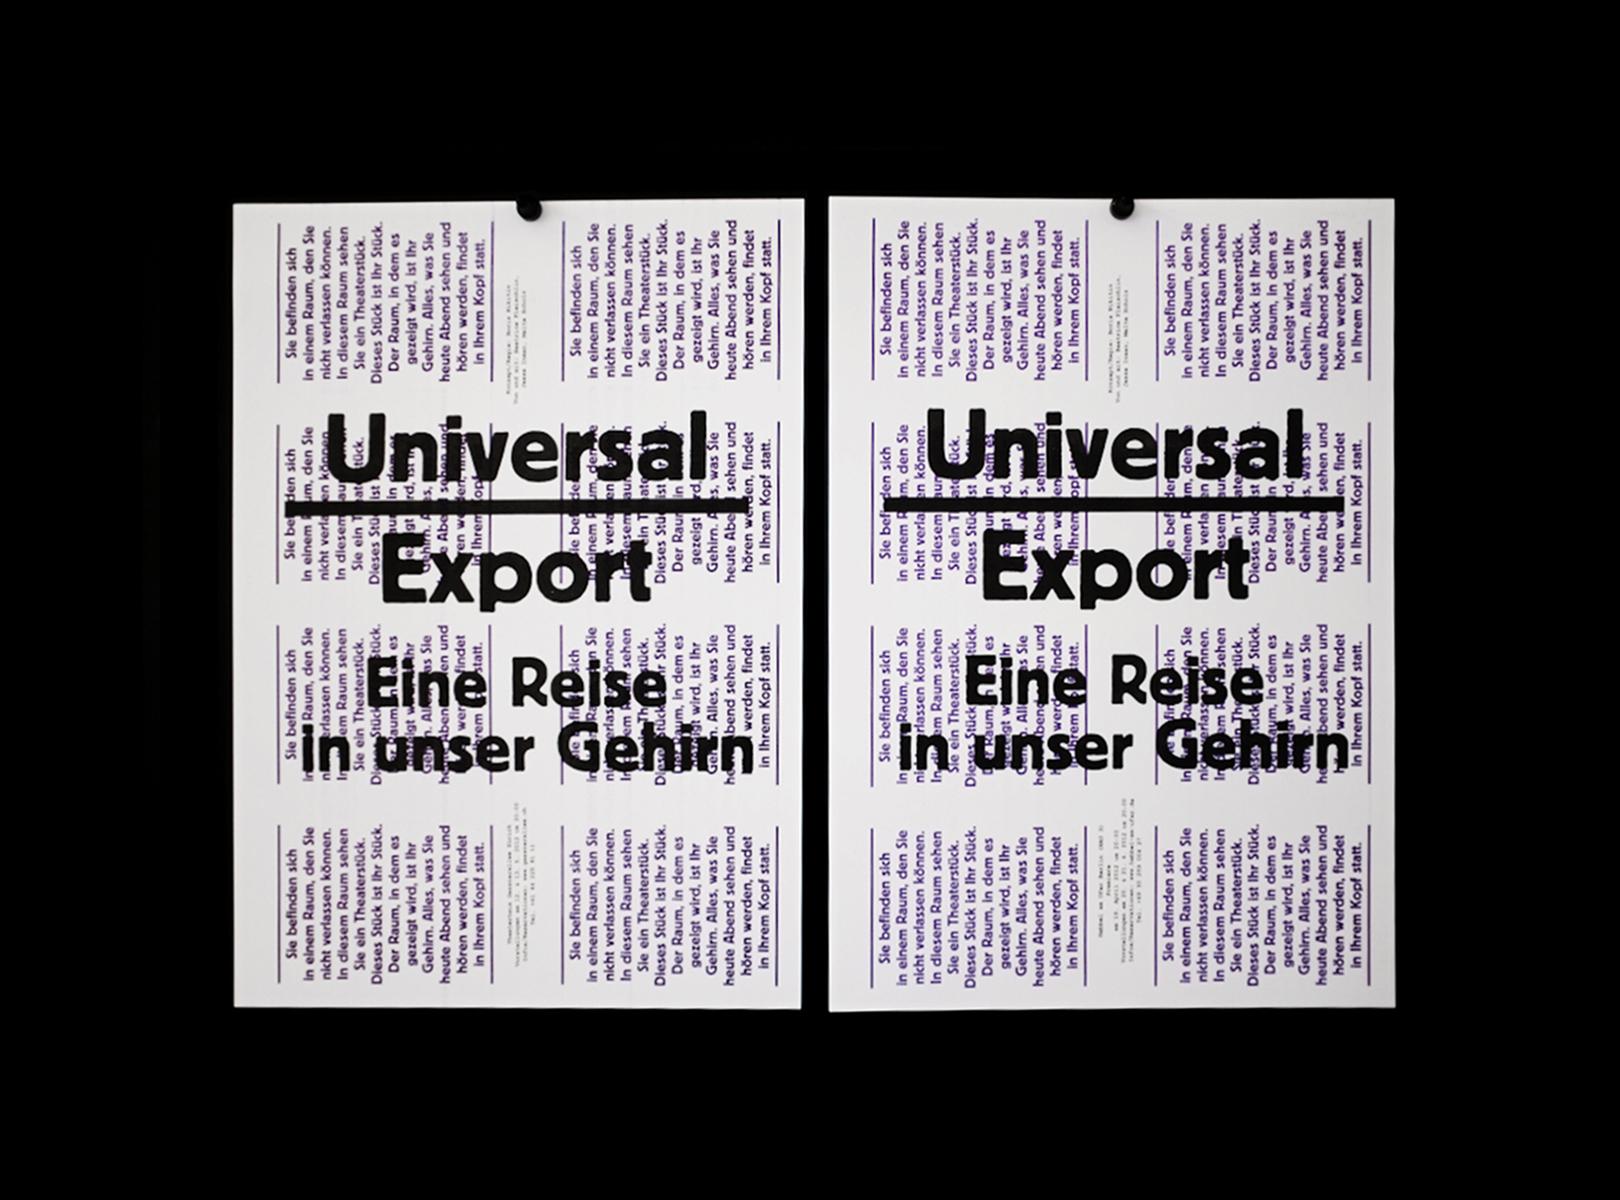 Universal Plakat_provi